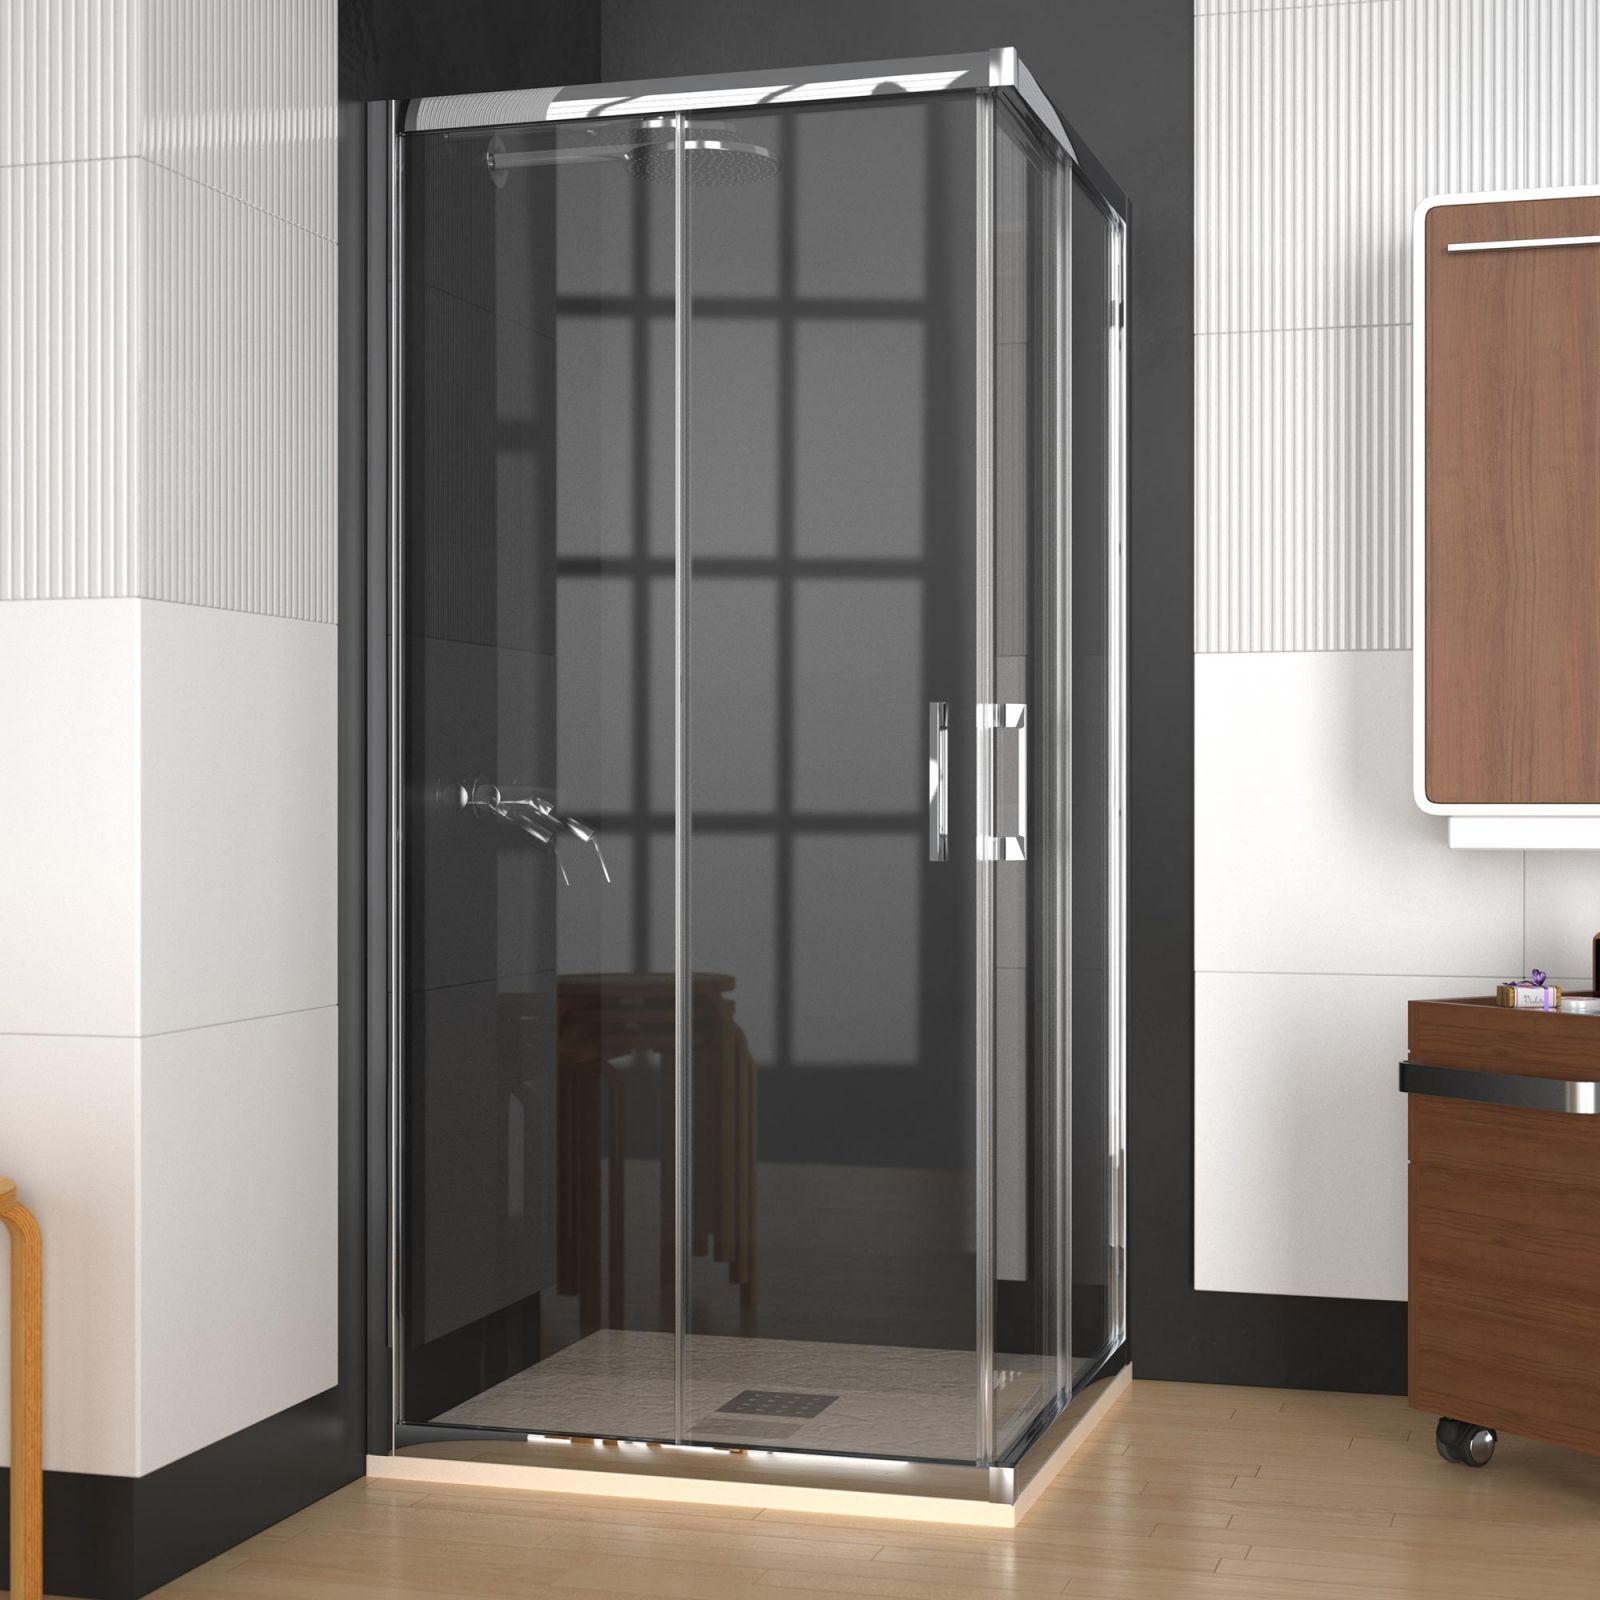 Mampara de ducha angular modelo cancun de doccia 276 00 - Modelos de banos y duchas ...